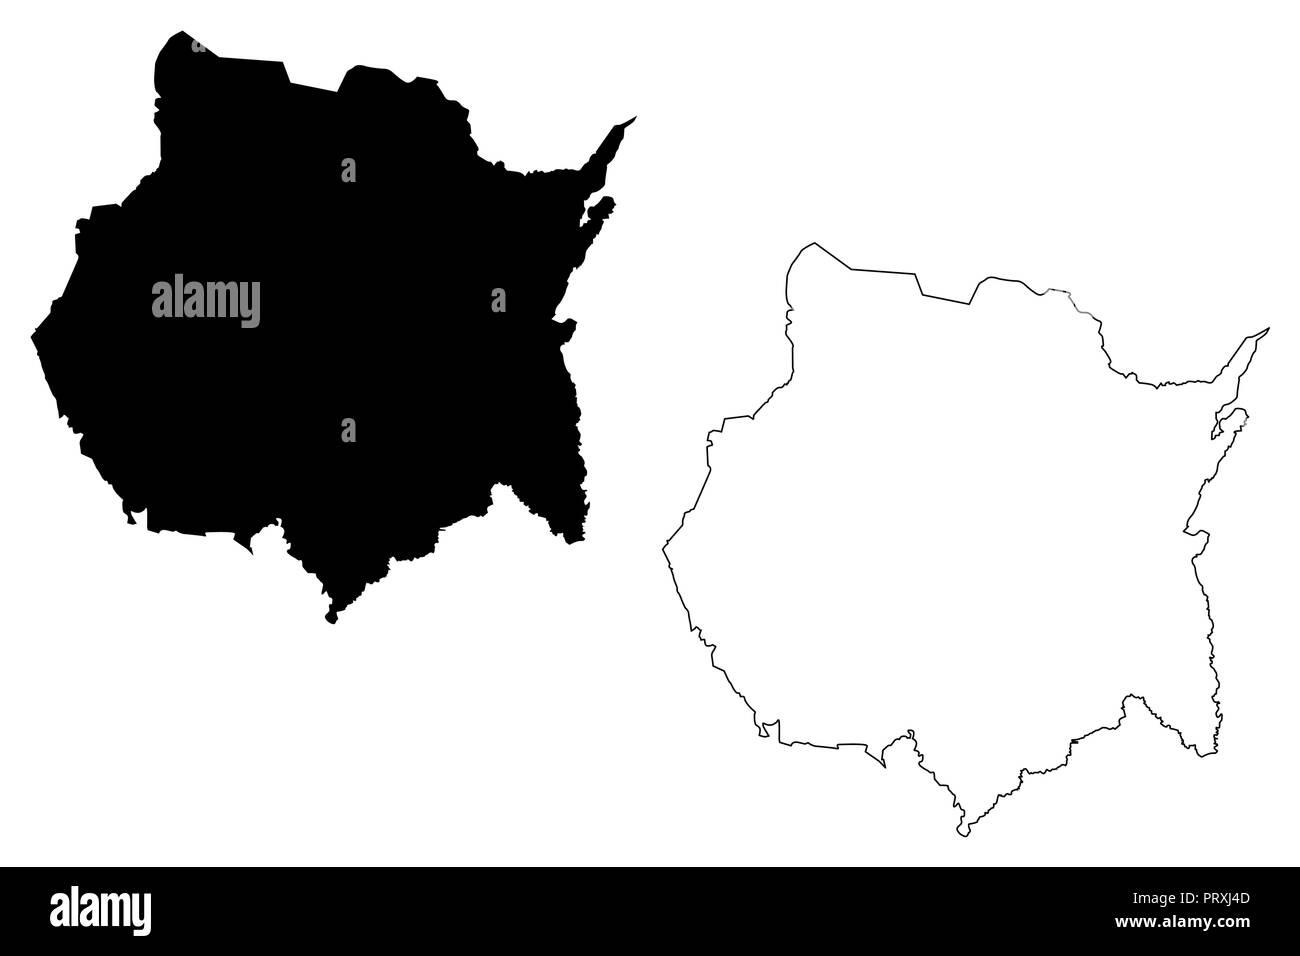 Morelos Estados Unidos Mexicanos México República Federal Mapa